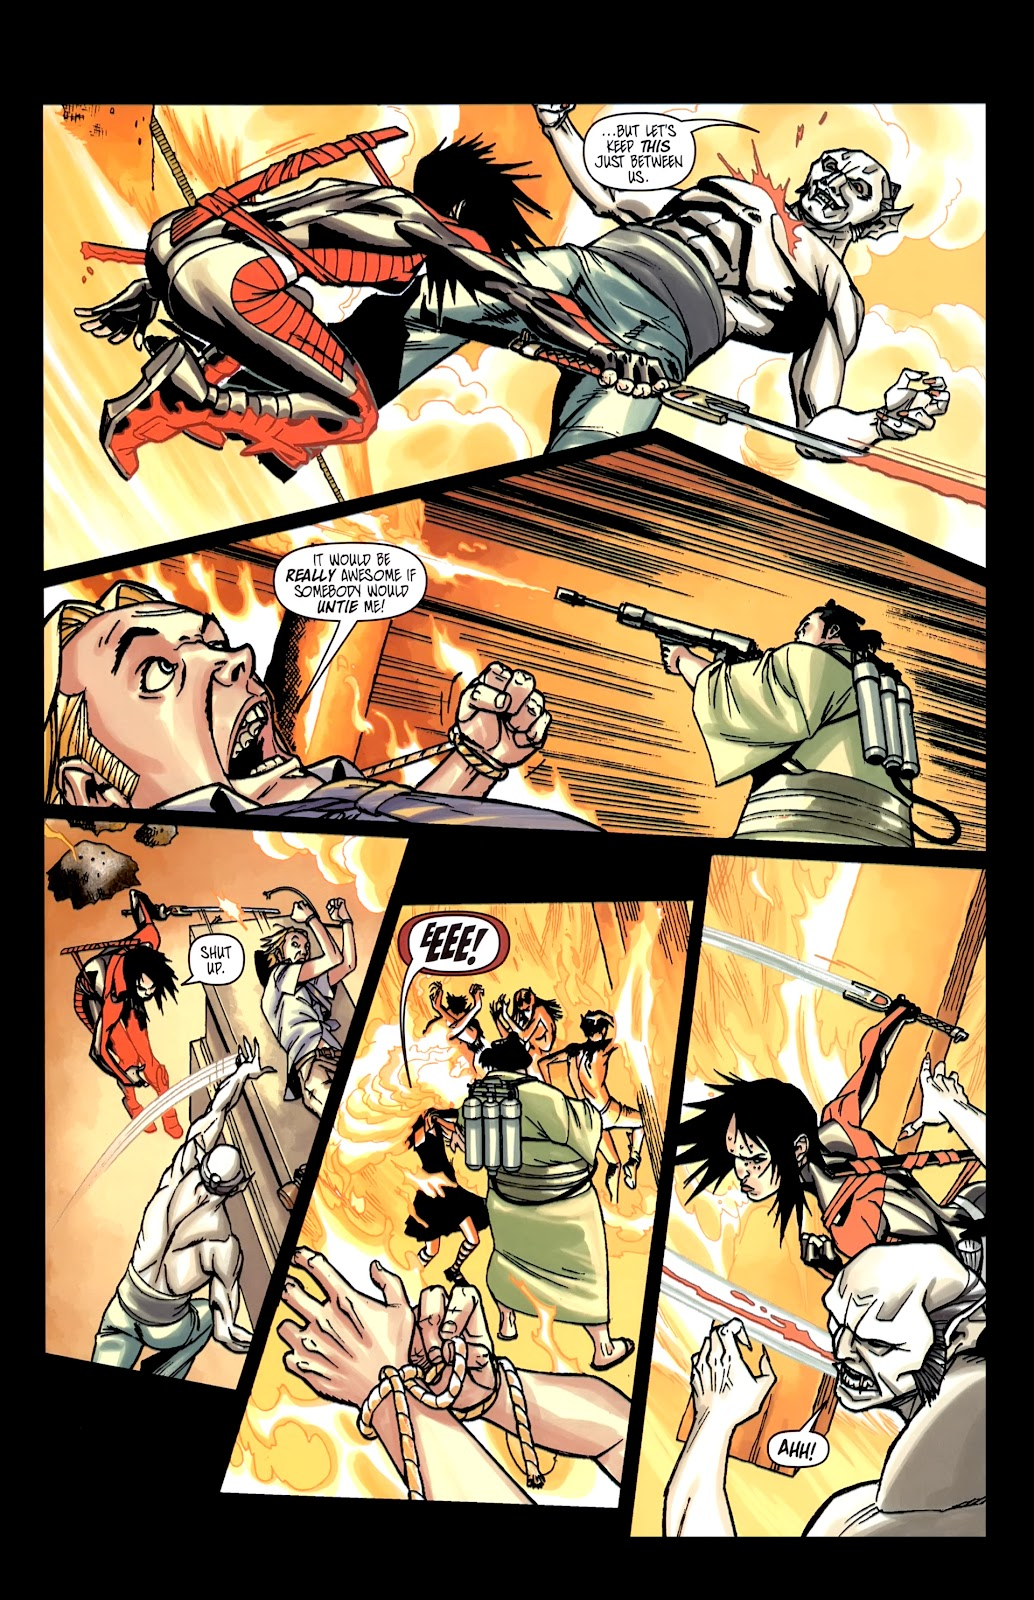 Read online Shinku comic -  Issue #5 - 19